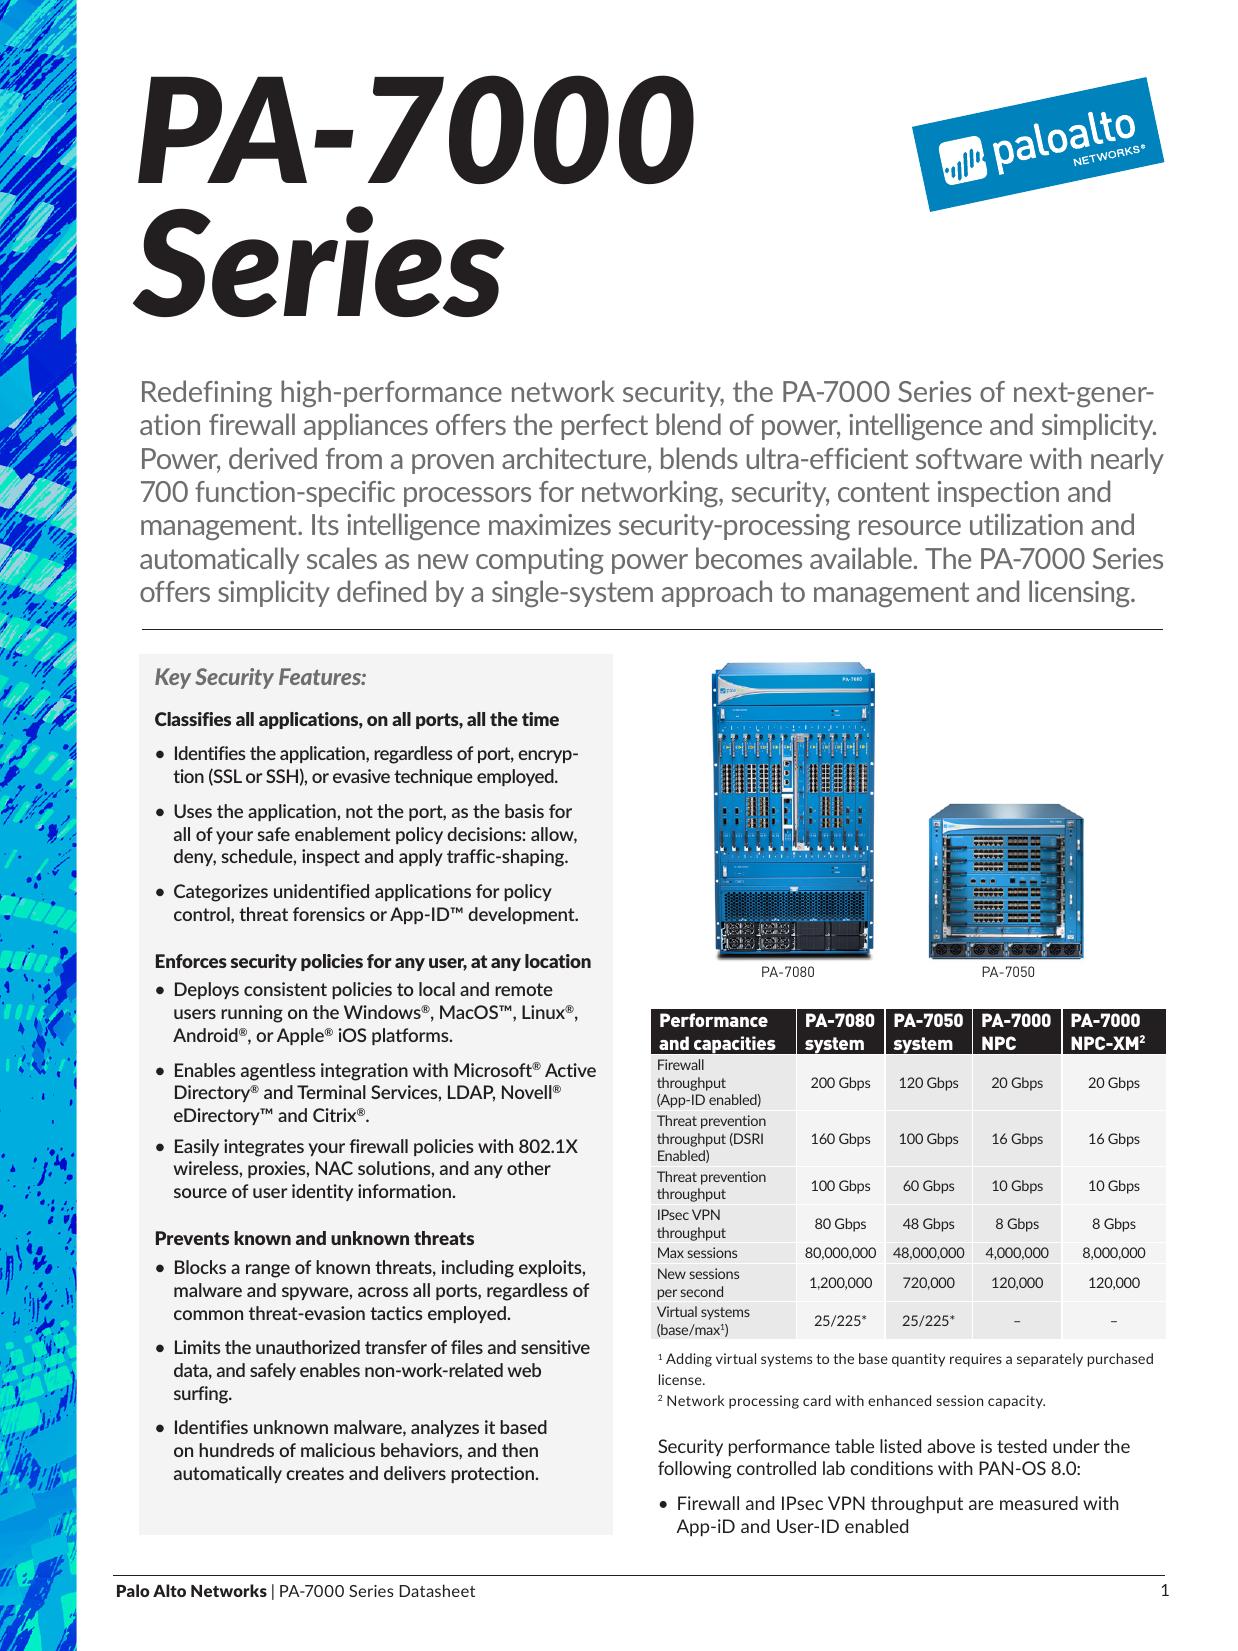 PA-7000 Series - Palo Alto Networks